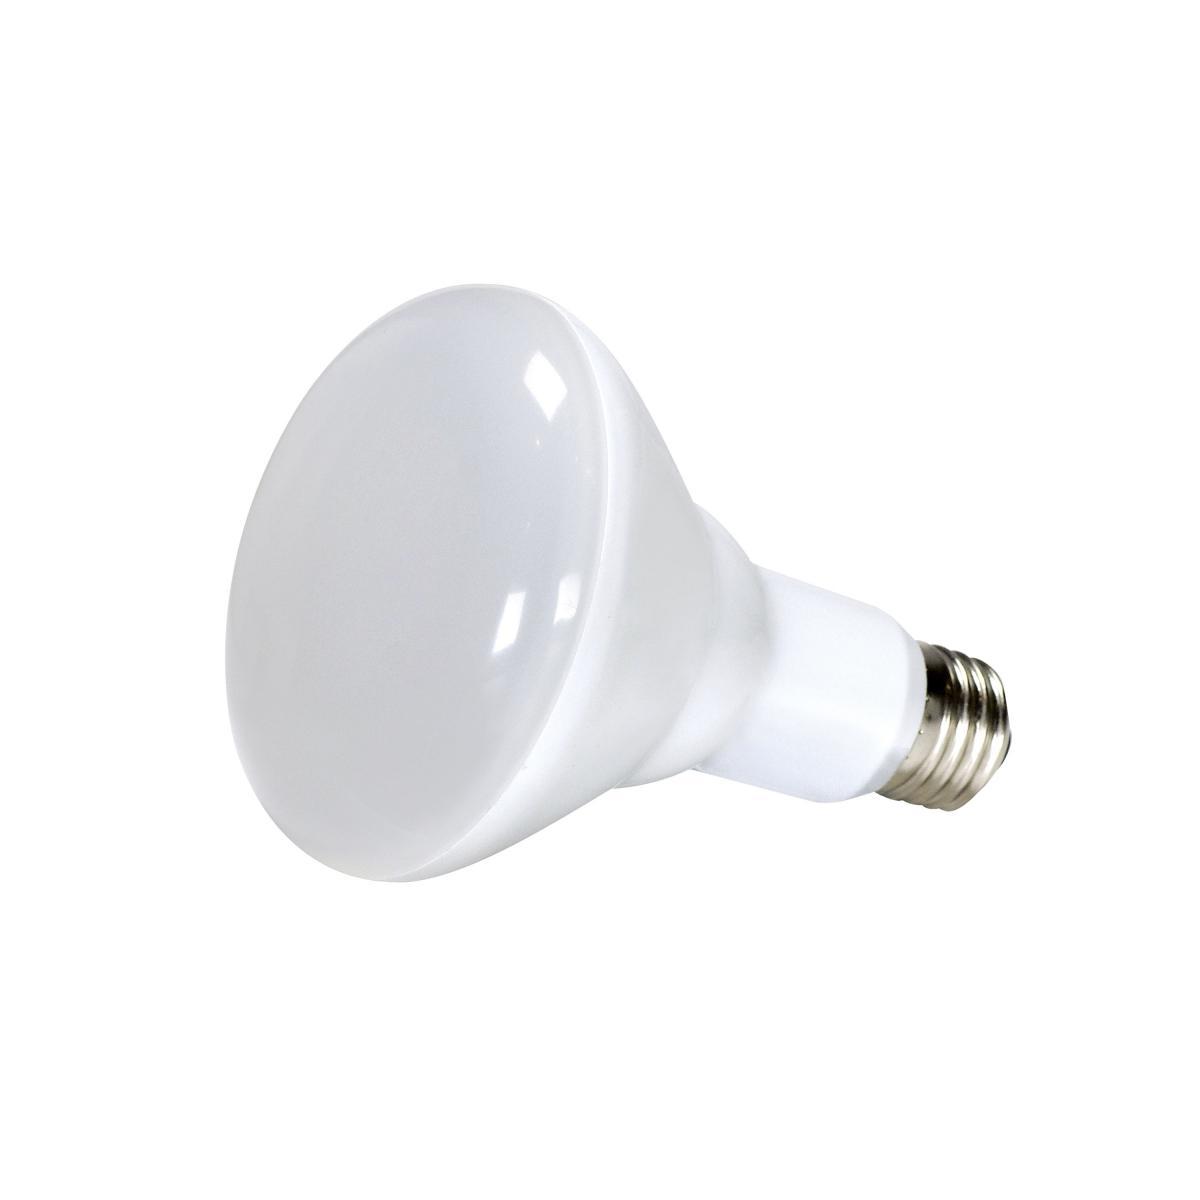 S29628 10BR30/LED/2700K/700L/120V/D